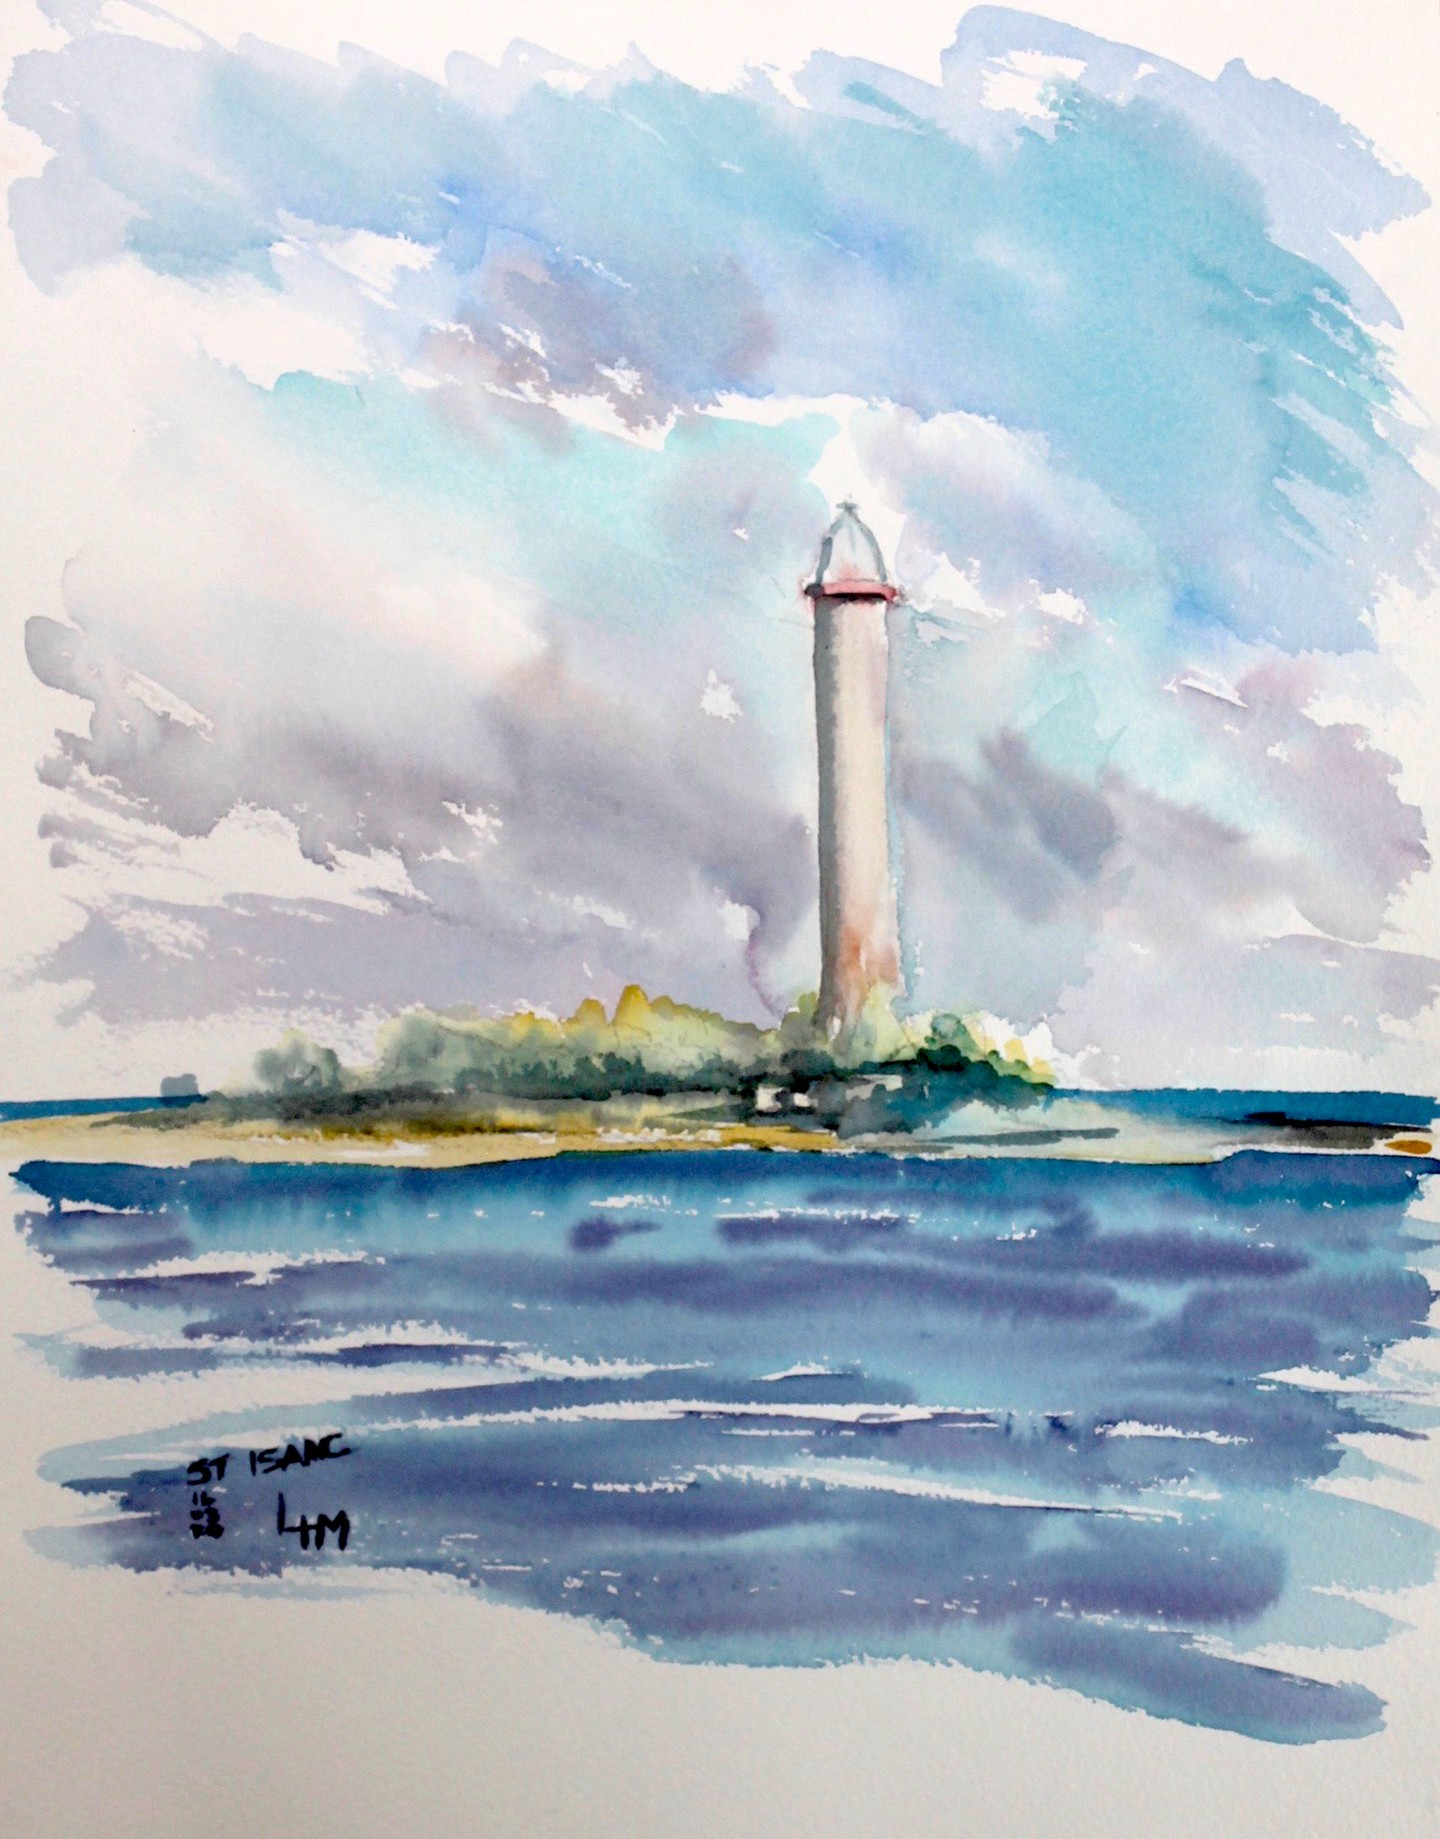 Linda H Matthews - Great Issac Cay - Bahamas